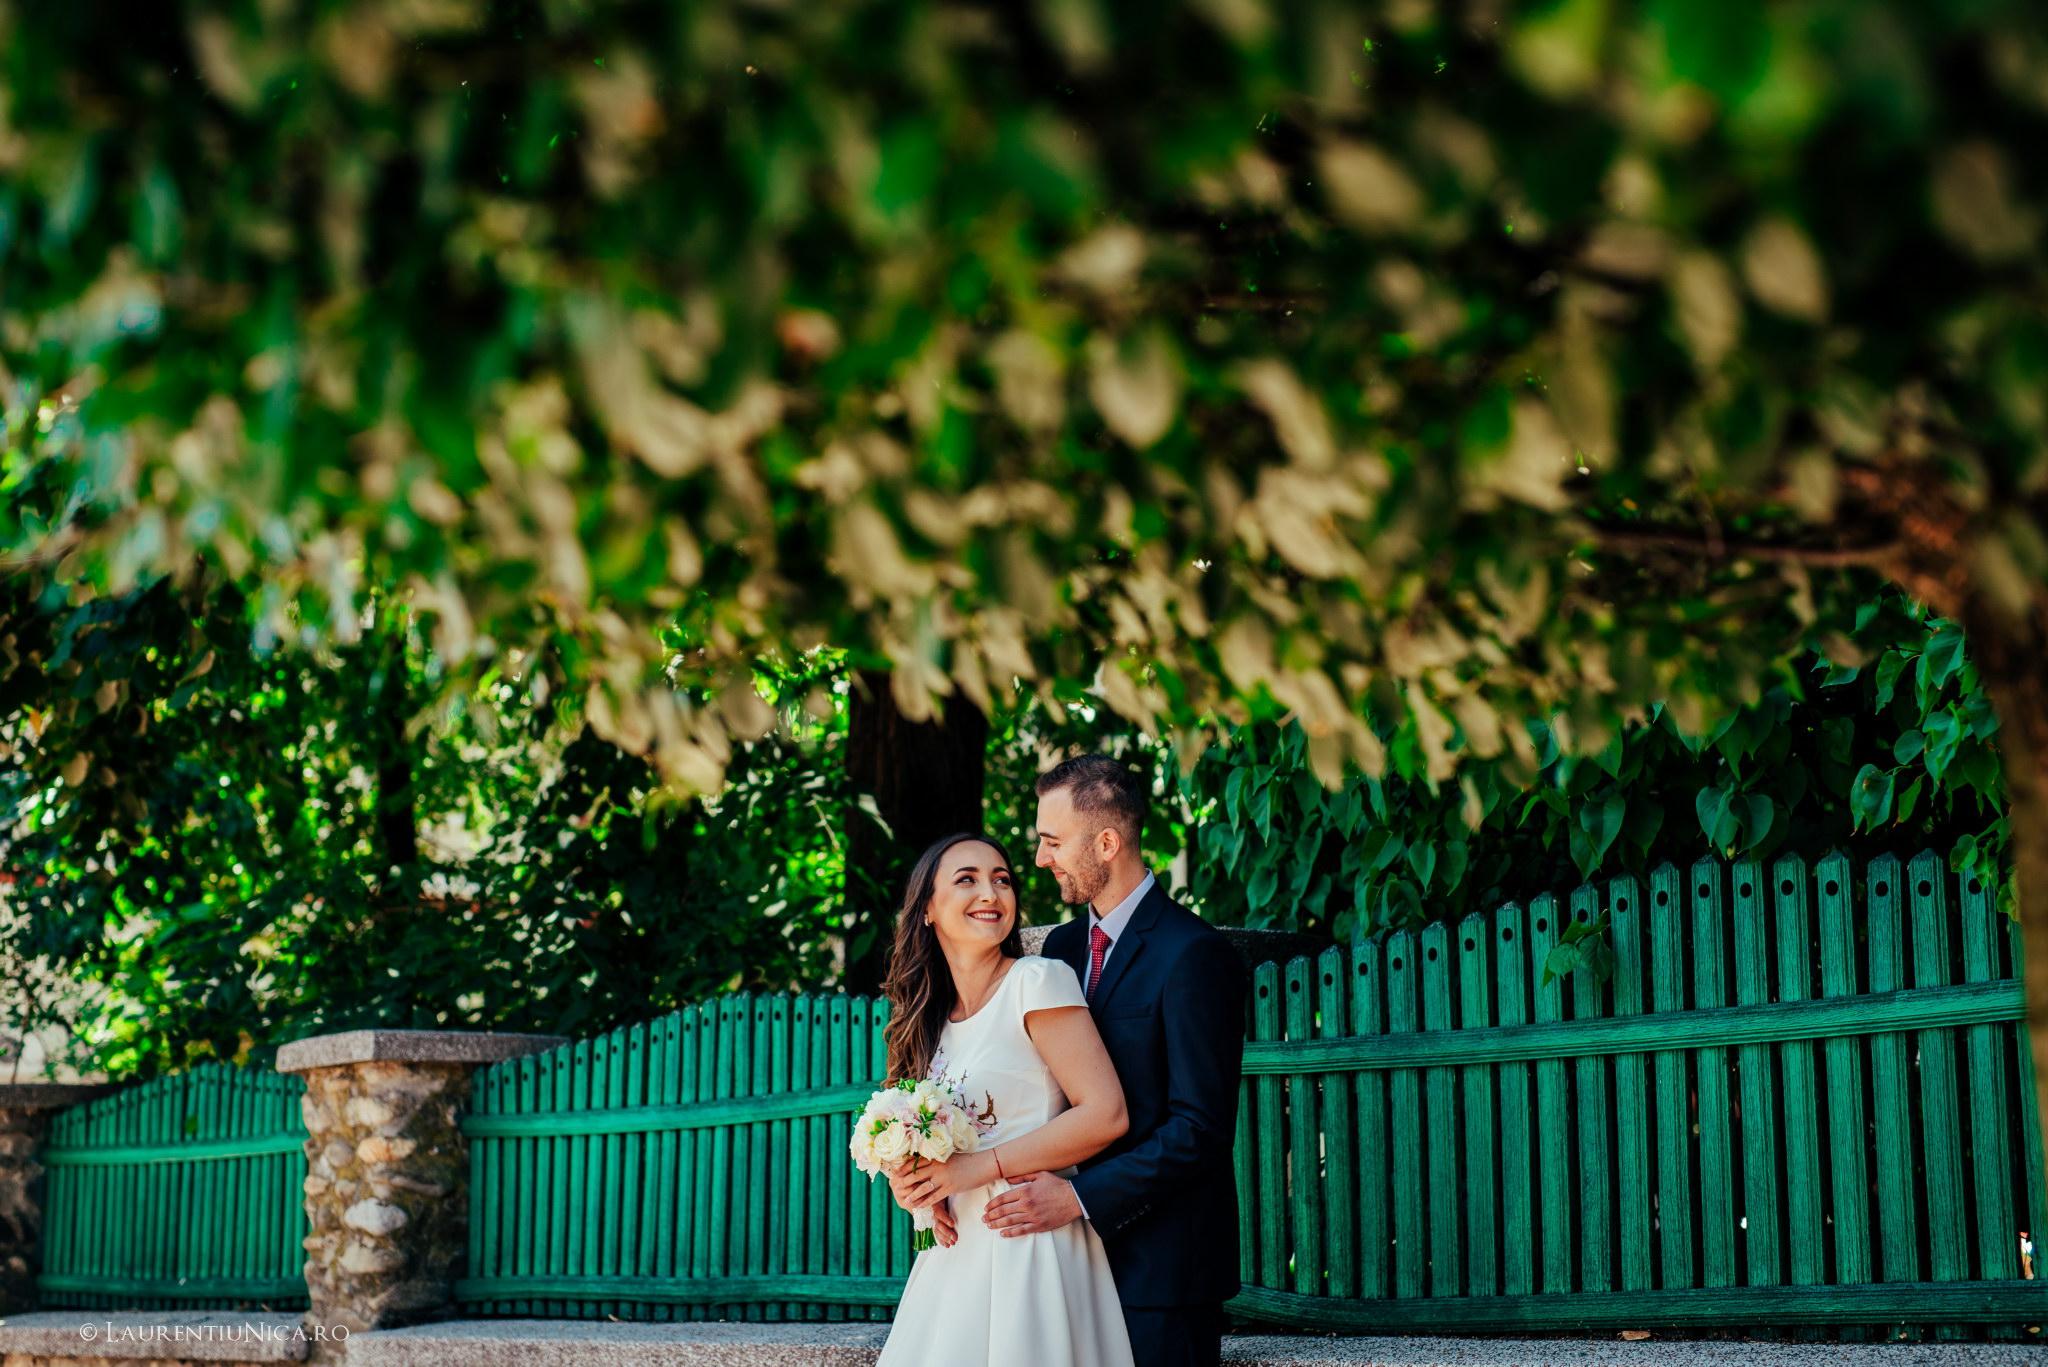 daiana si madalin fotograf nunta laurentiu nica targu jiu gorj 01 - Daiana & Madalin | Fotografii nunta | Targu-Jiu | Gorj